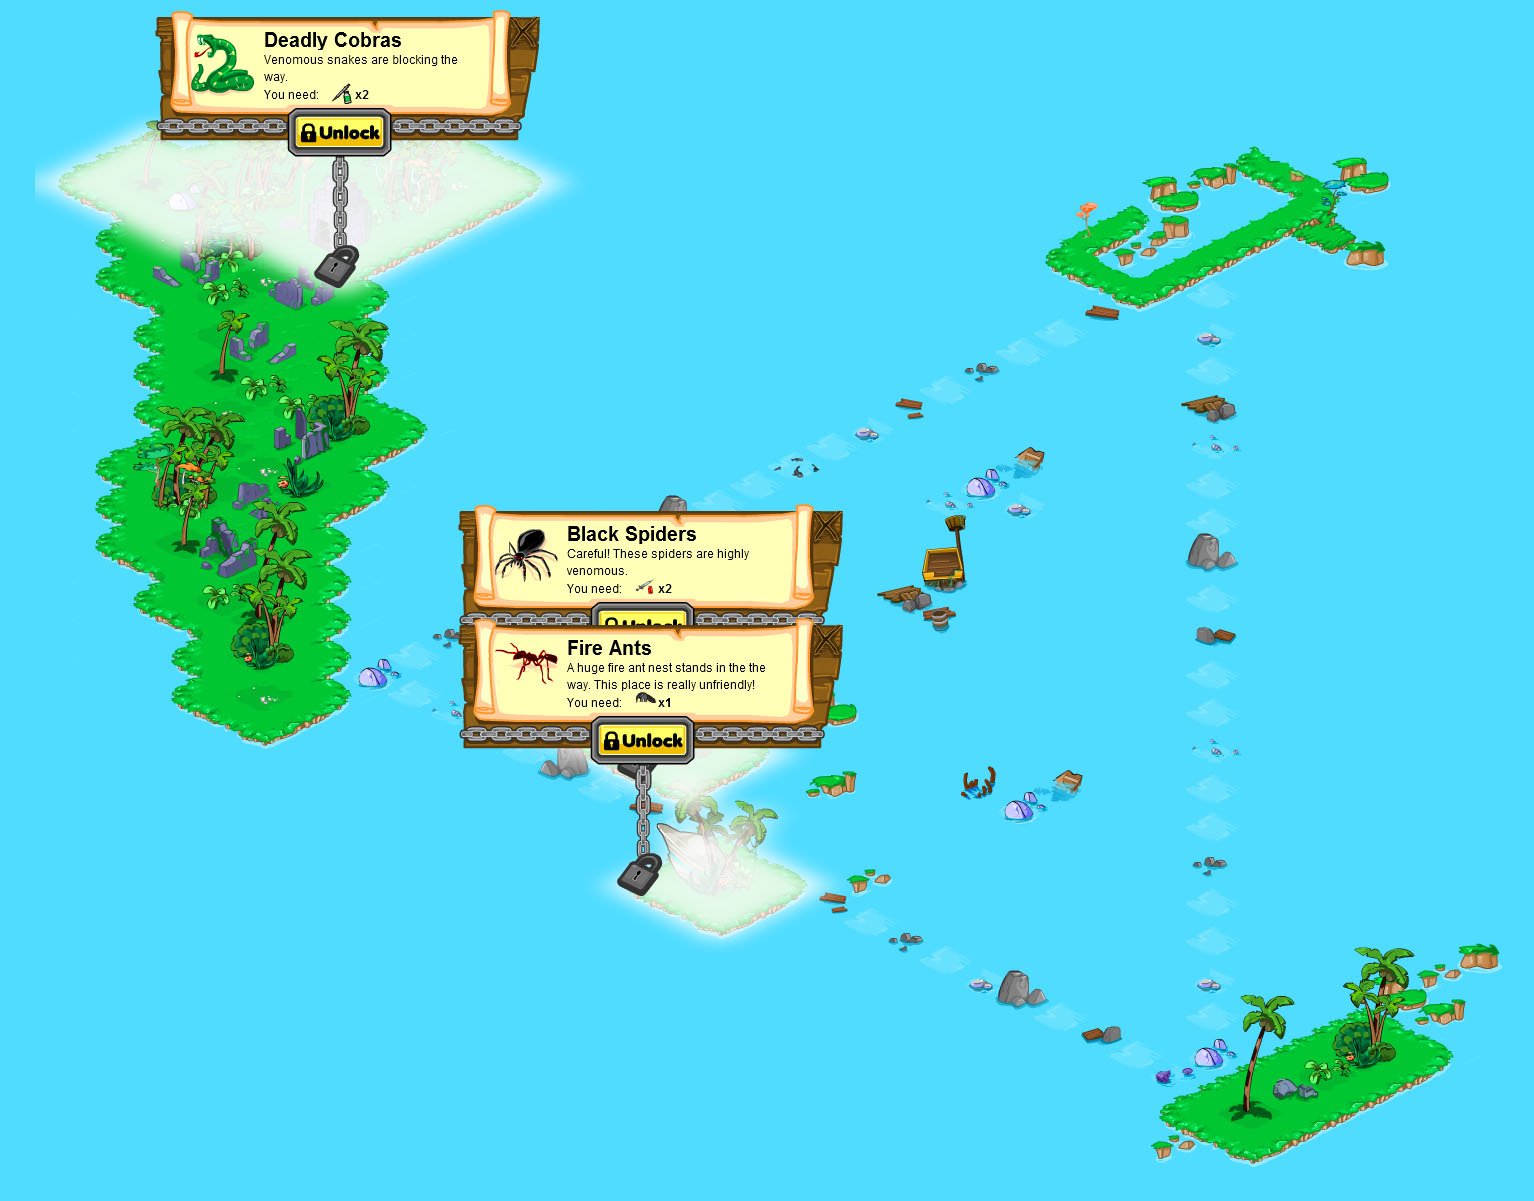 Bermuda Triangle | Treasure Madness Wiki | FANDOM powered by Wikia